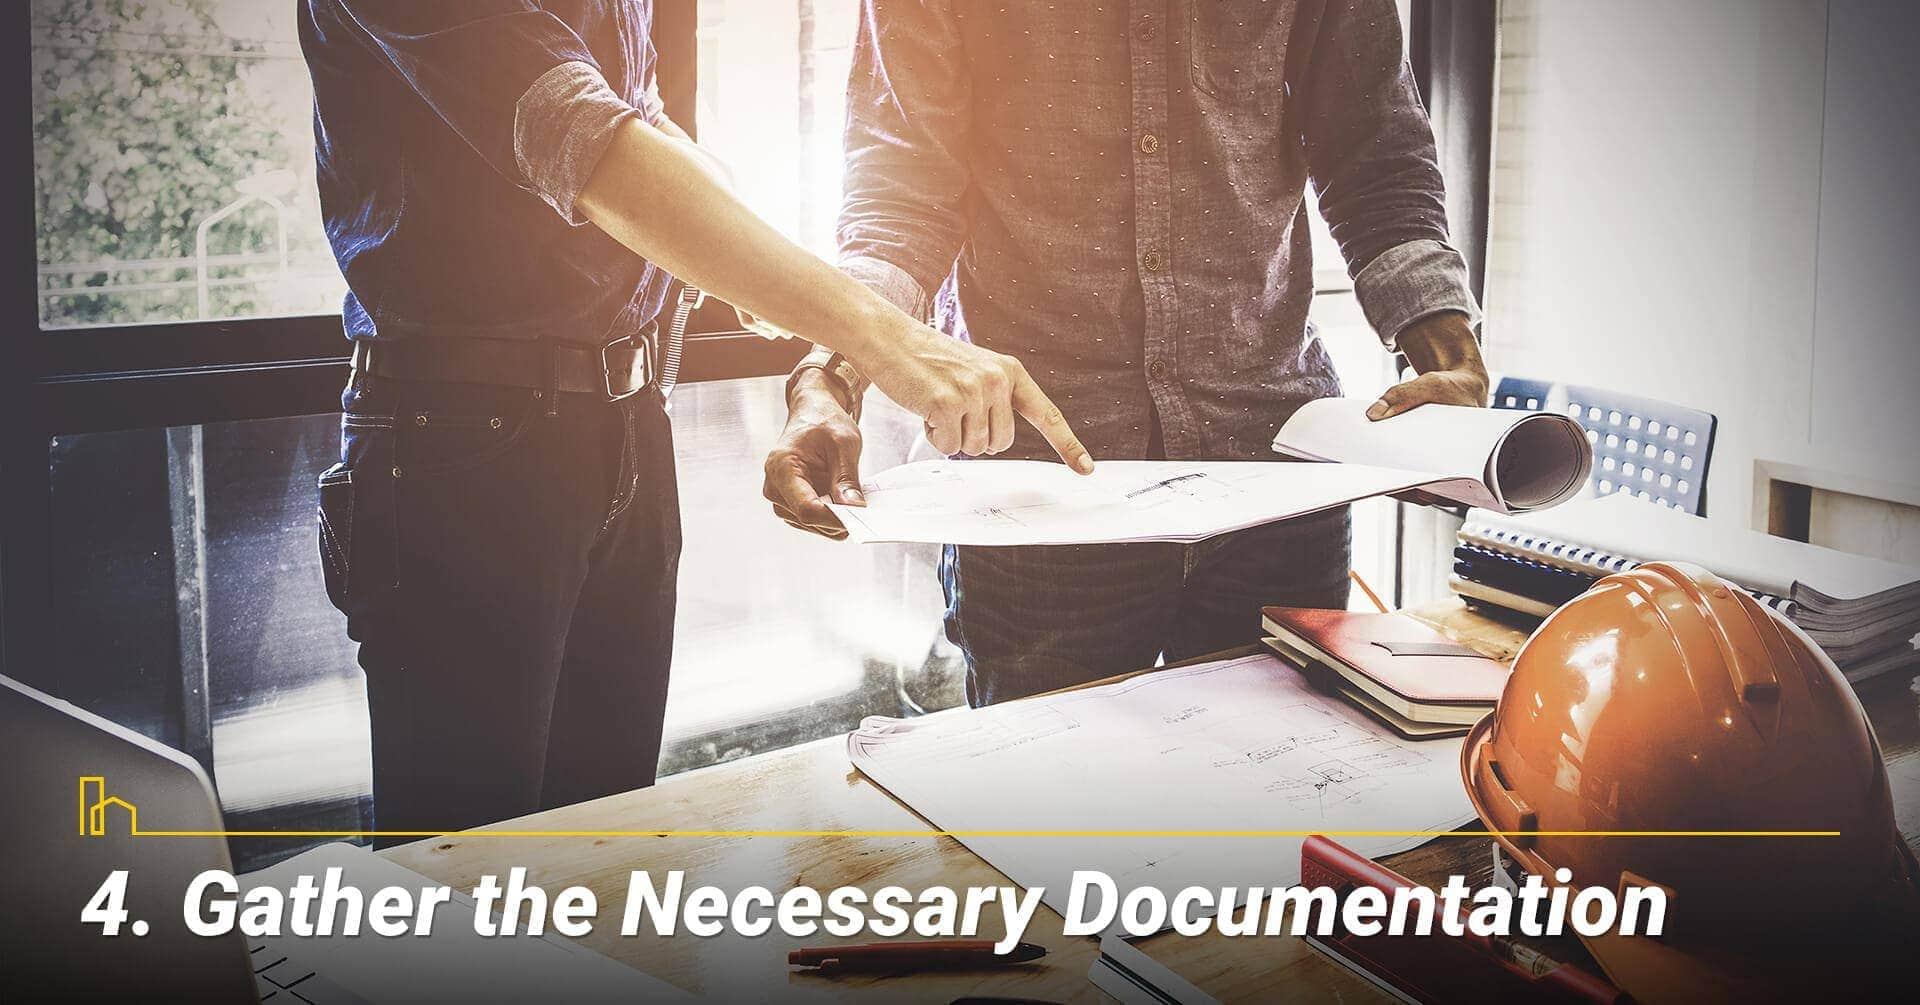 Gather the Necessary Documentation